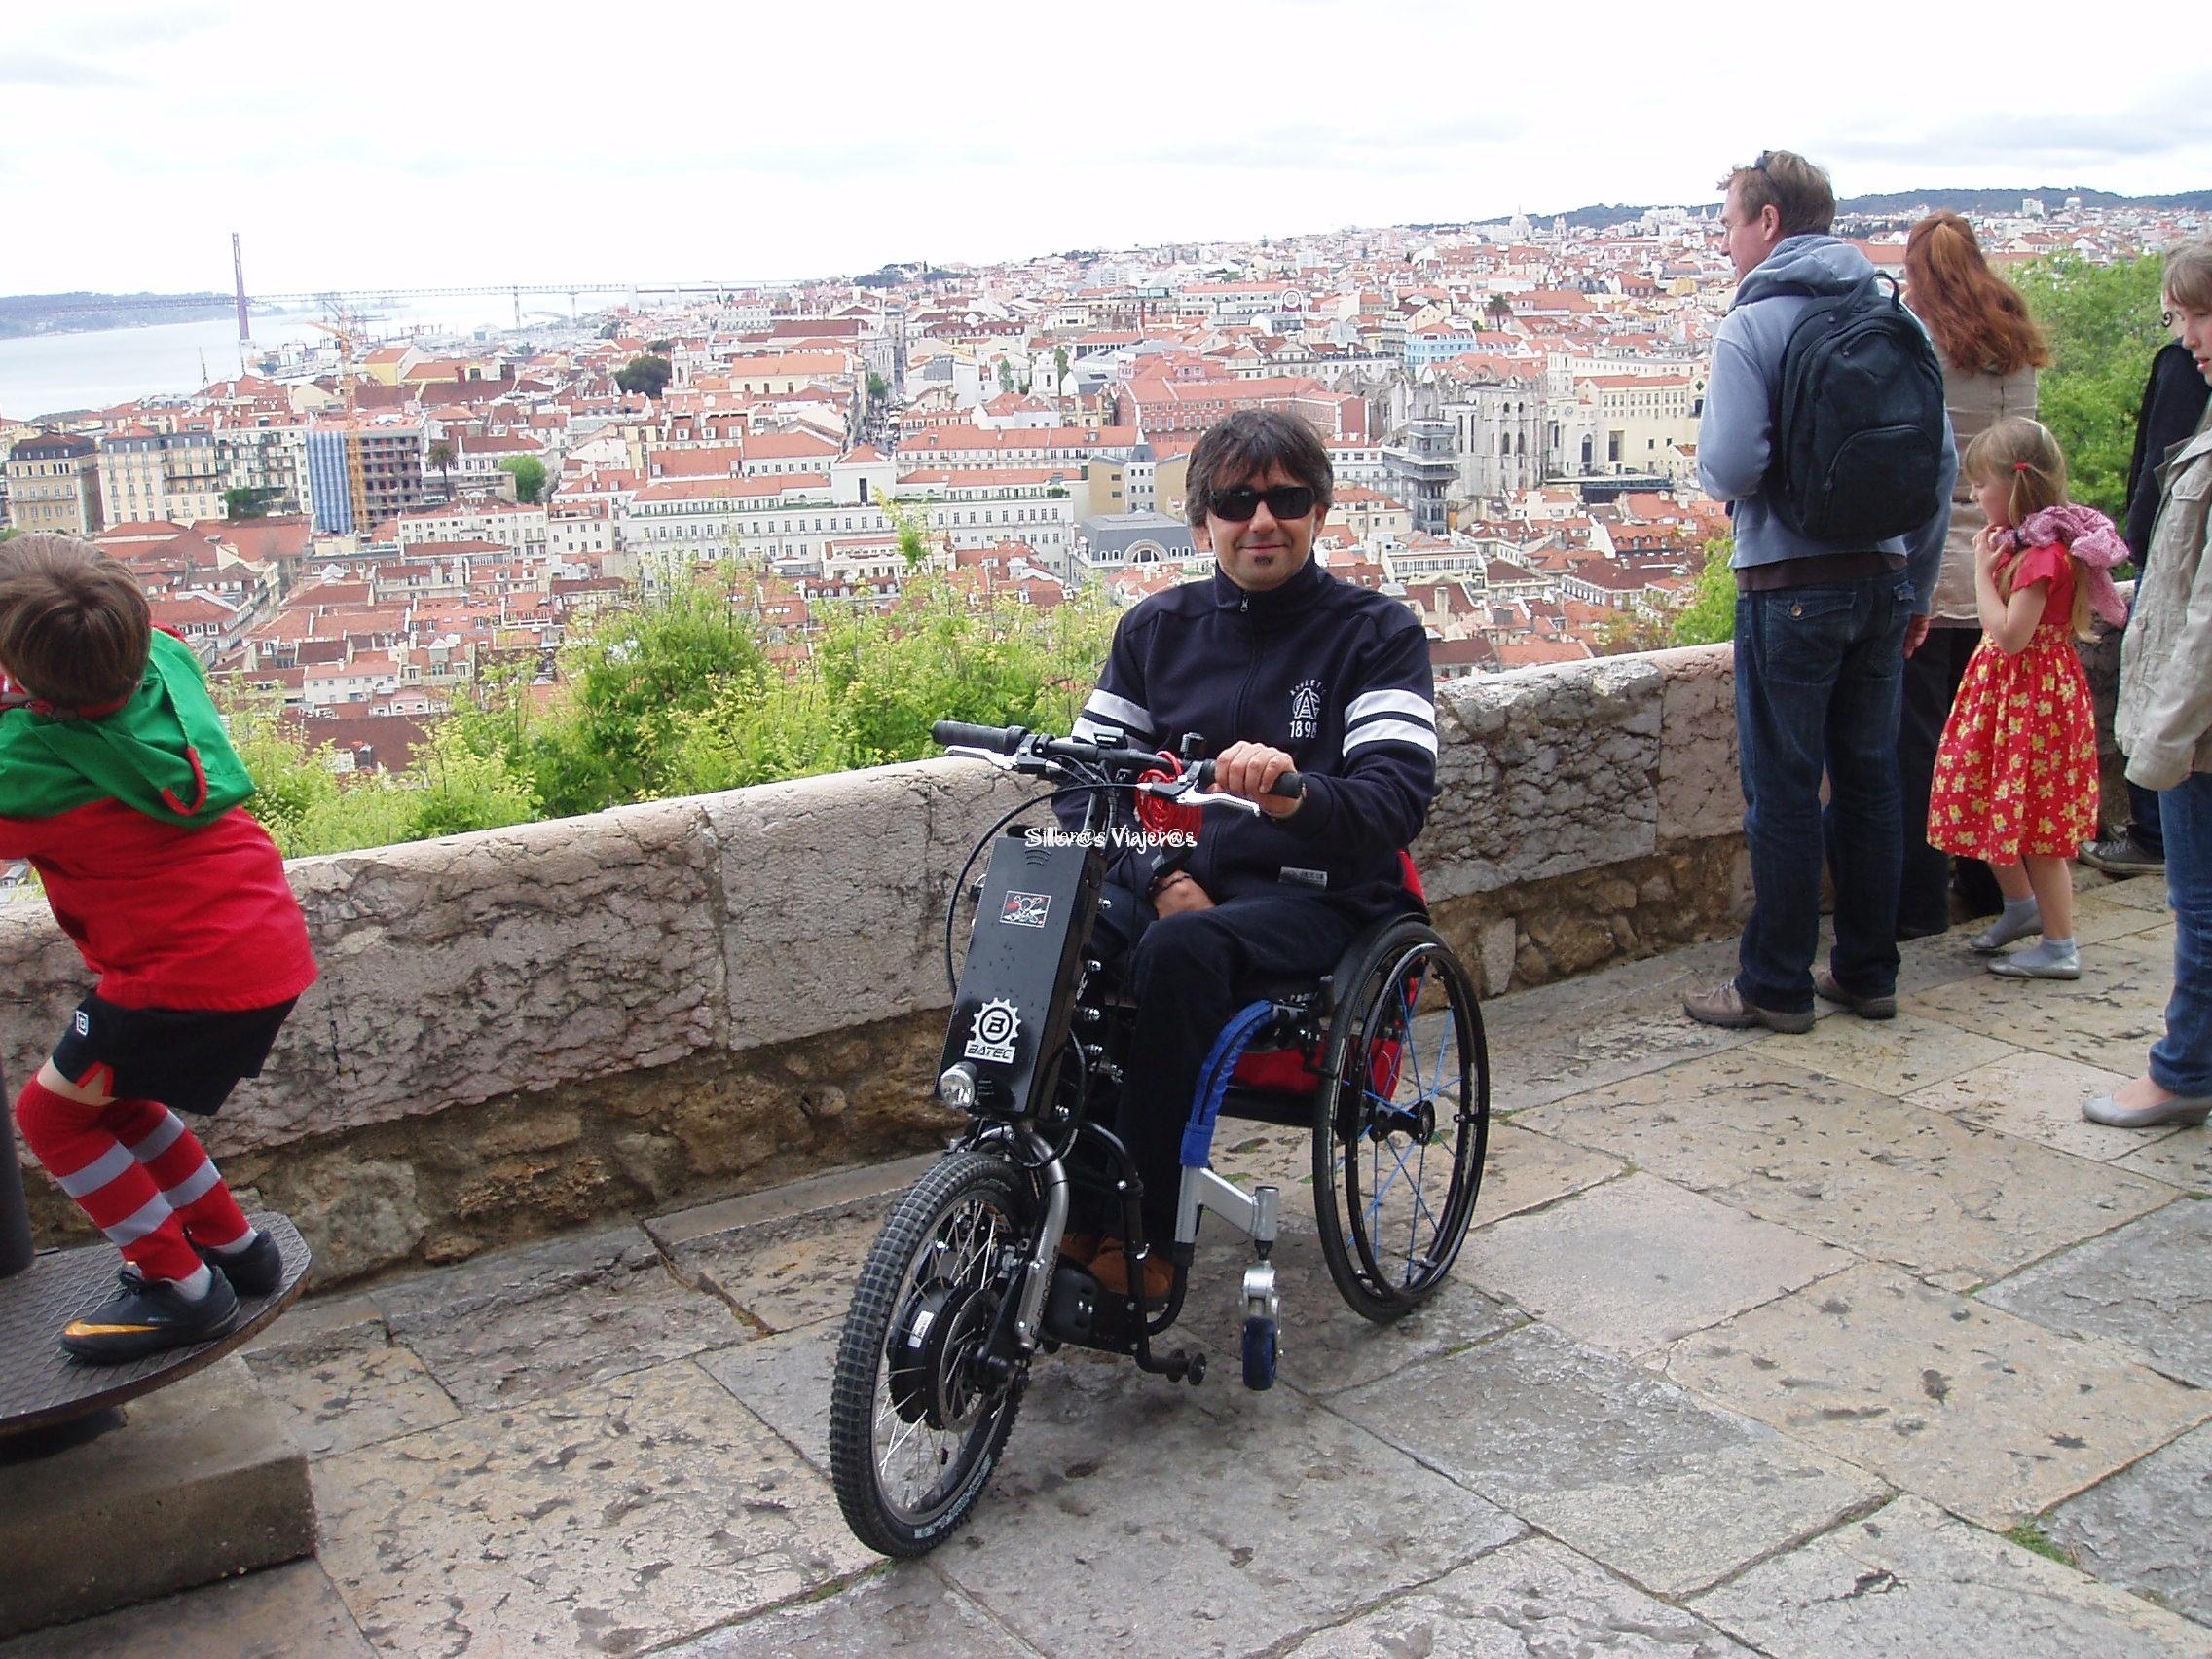 Sillerosviajeros en Lisboa